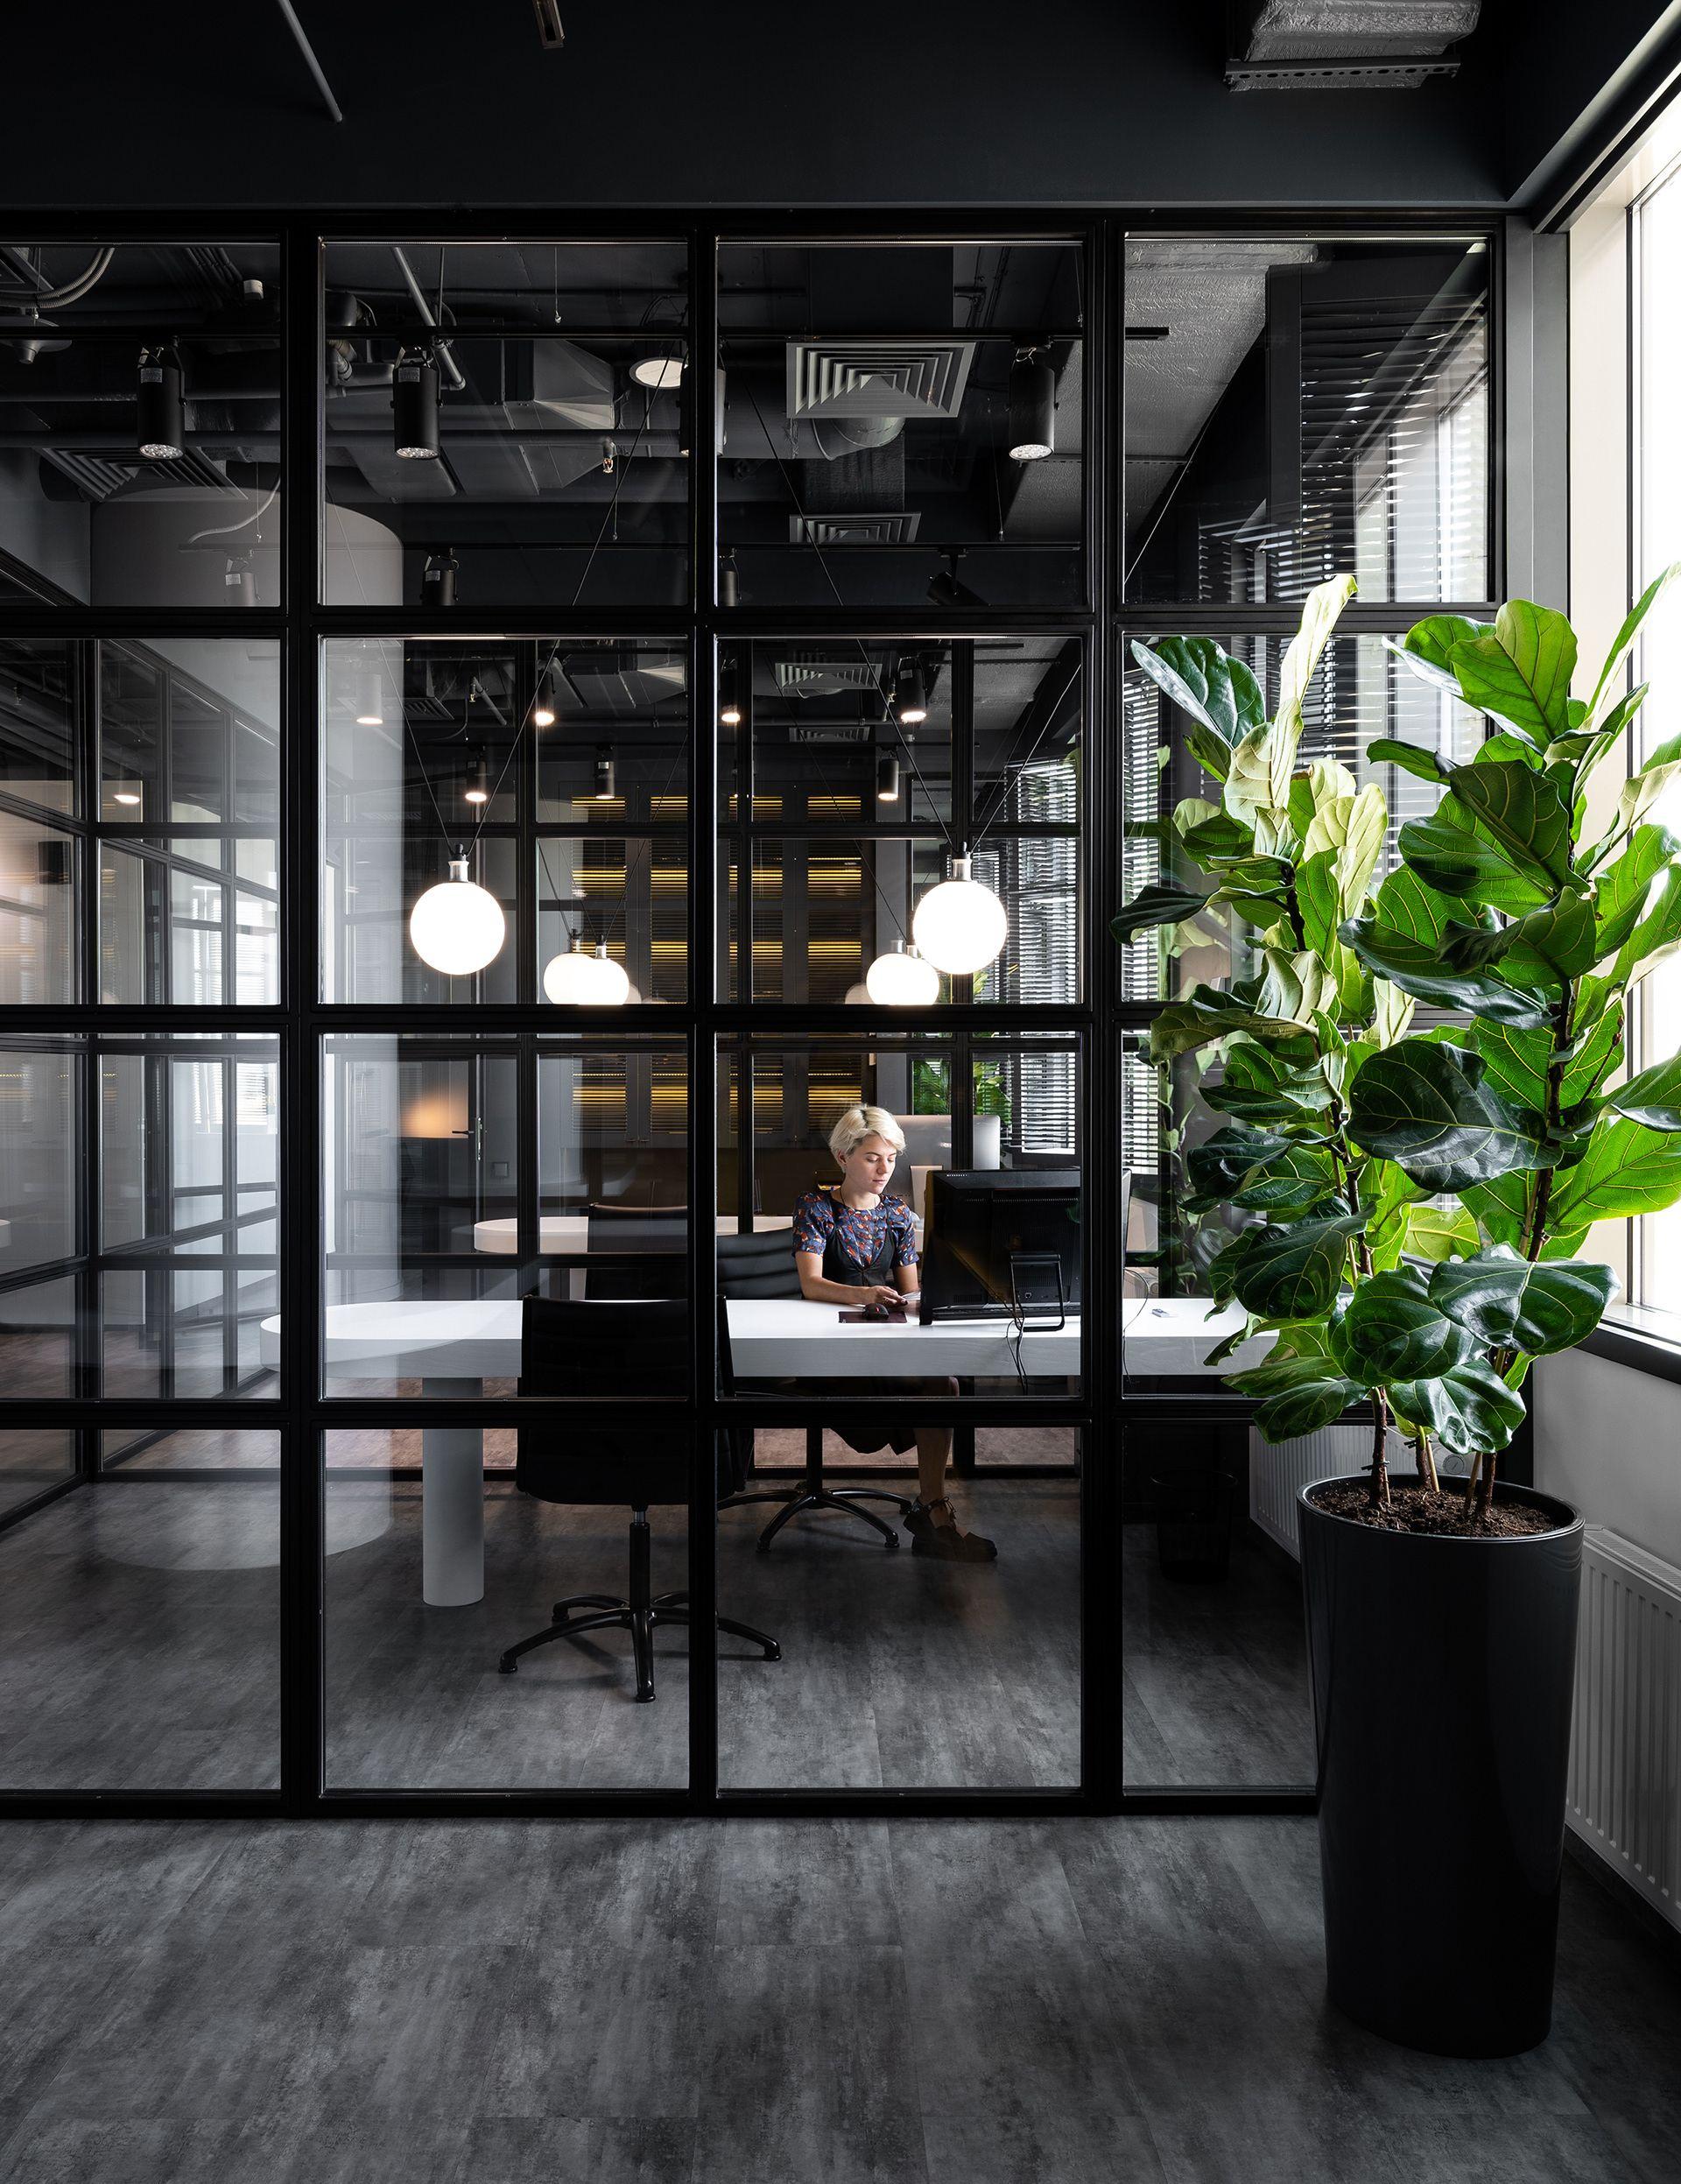 Law Office 150m2 On Behance Industrial Office Design Law Office